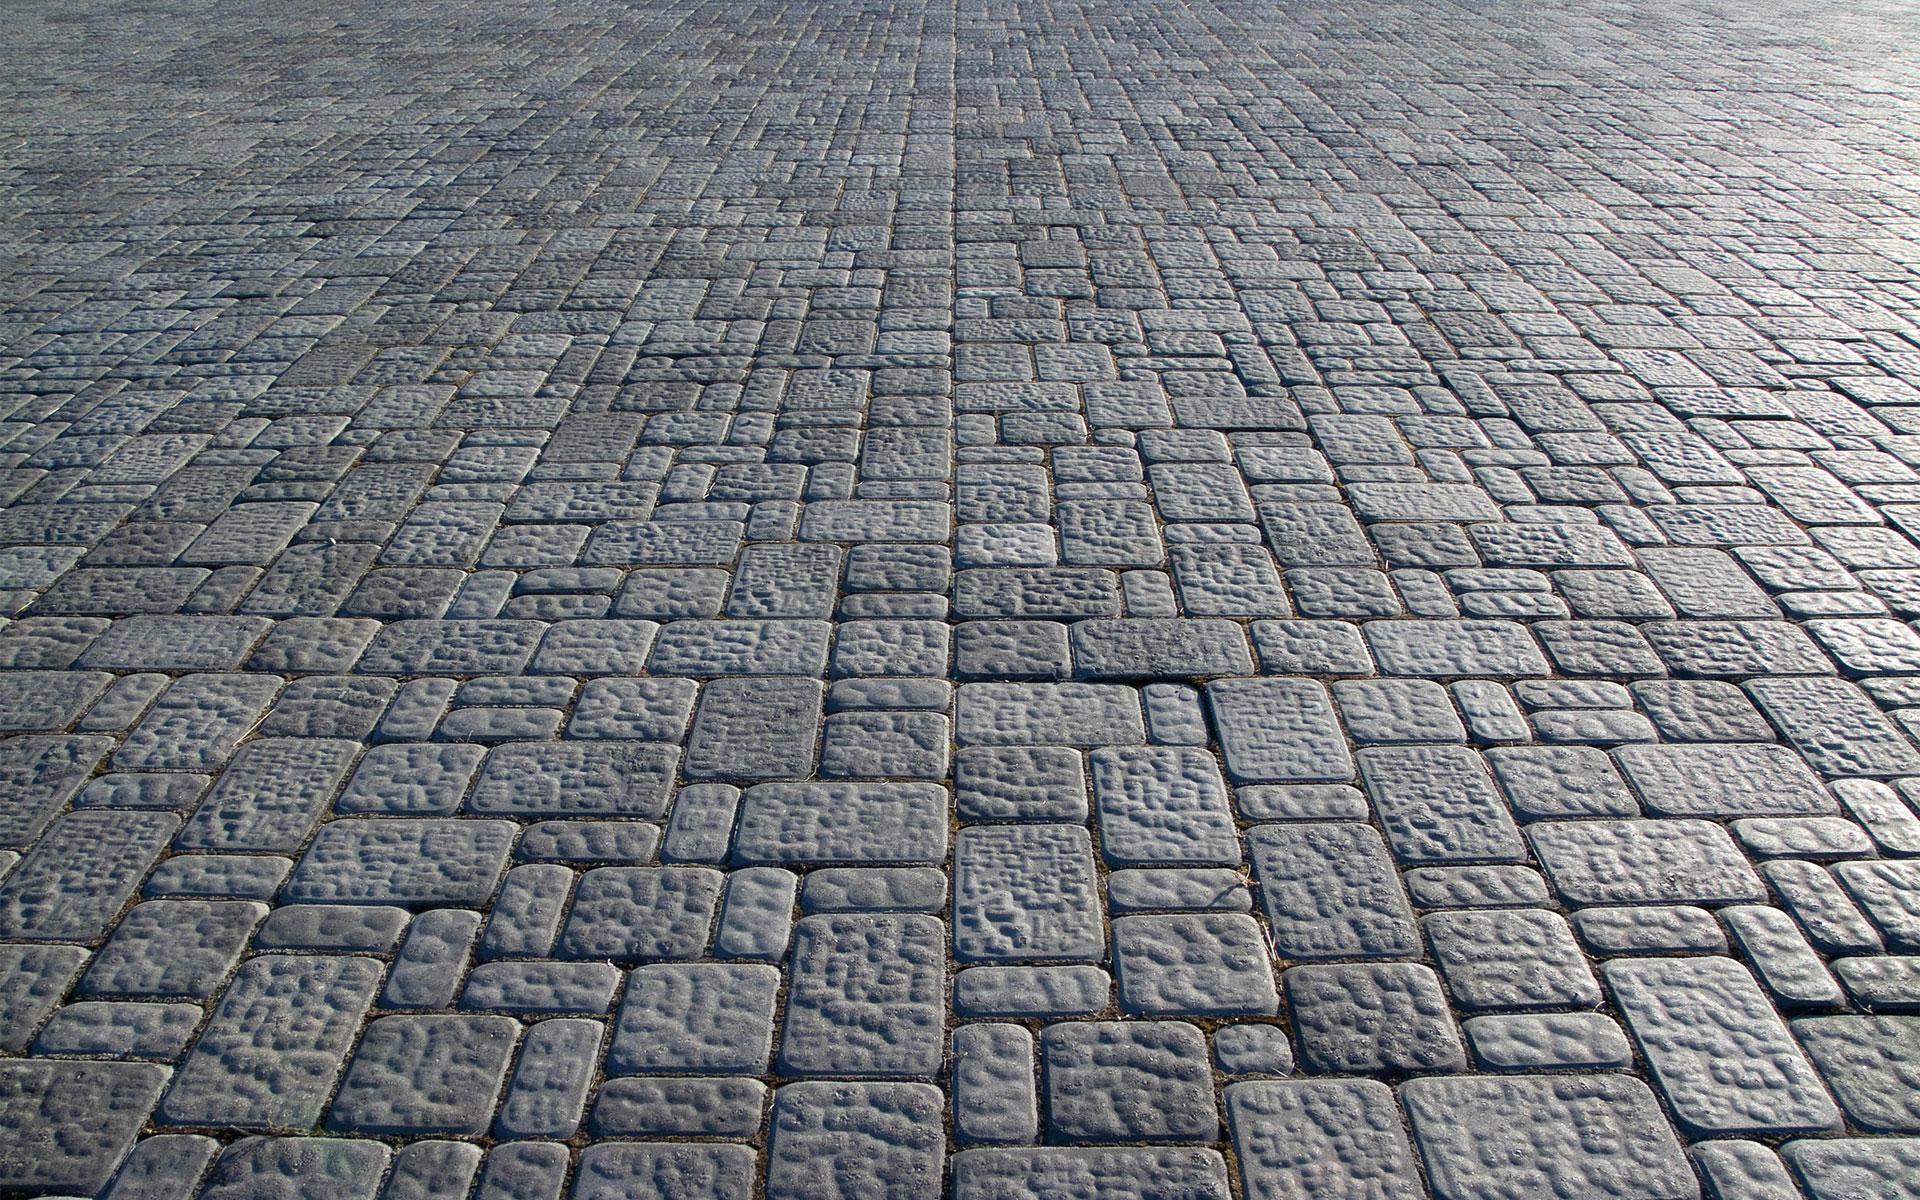 Stone Pavement Texture Hd Wallpaper Wallpaper List 1920x1200